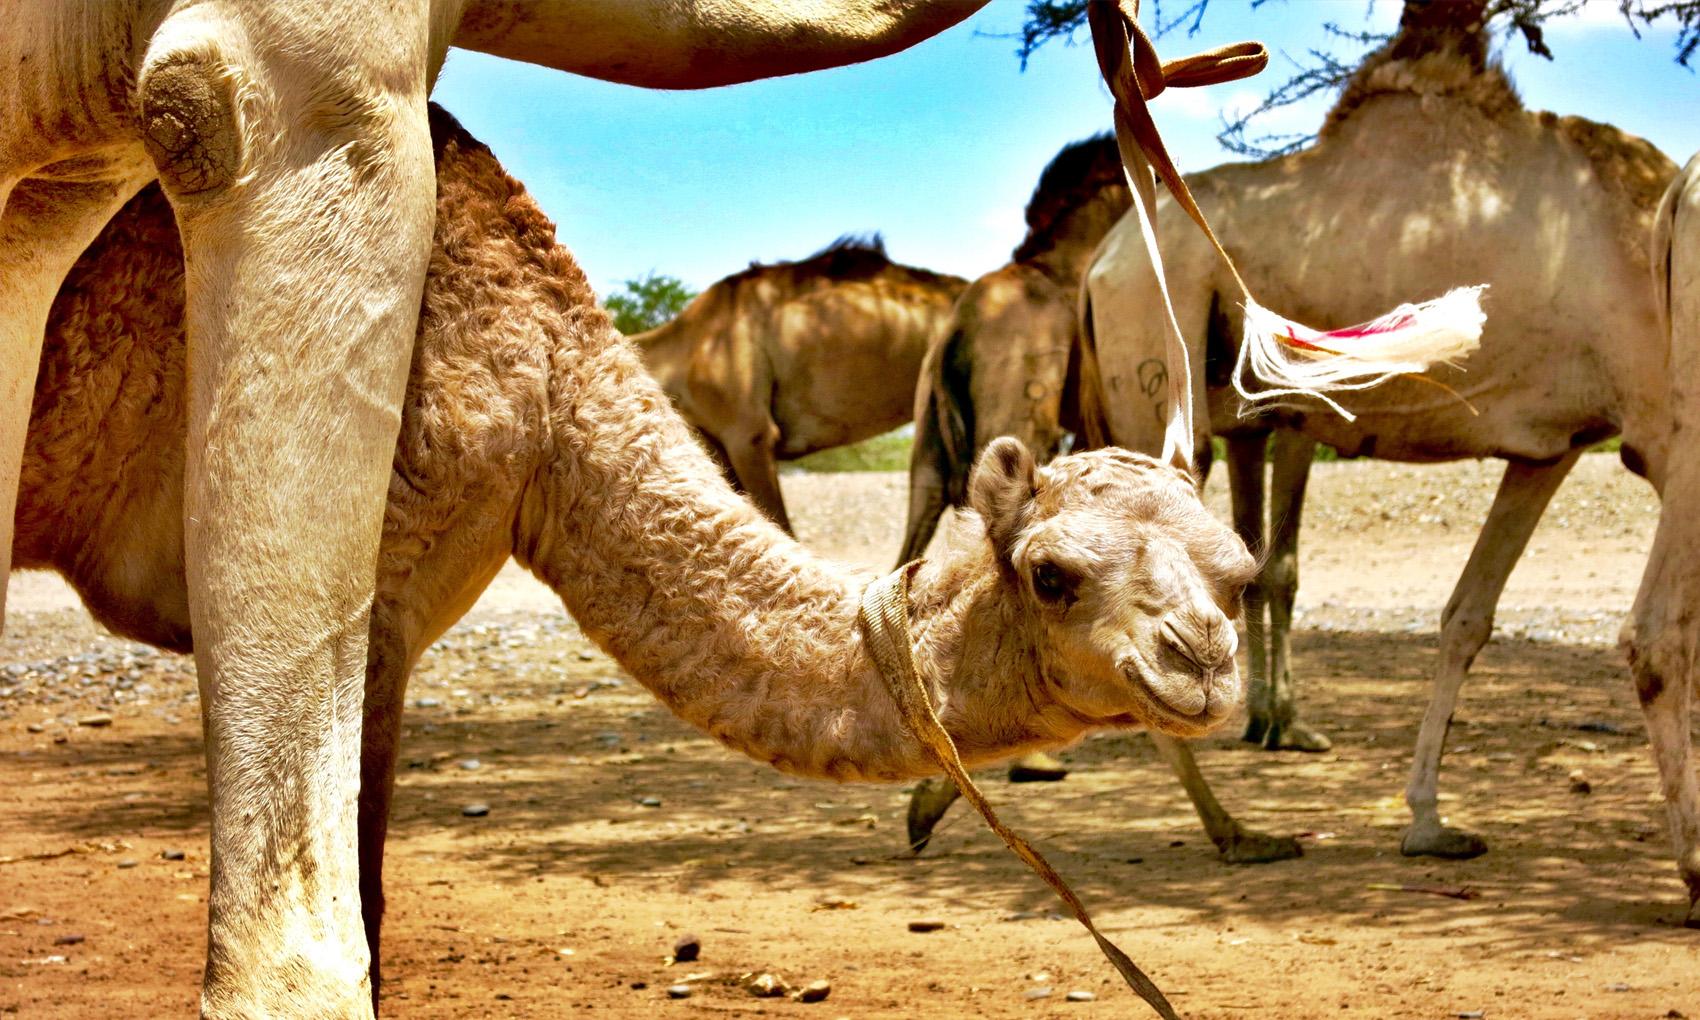 Camel 03